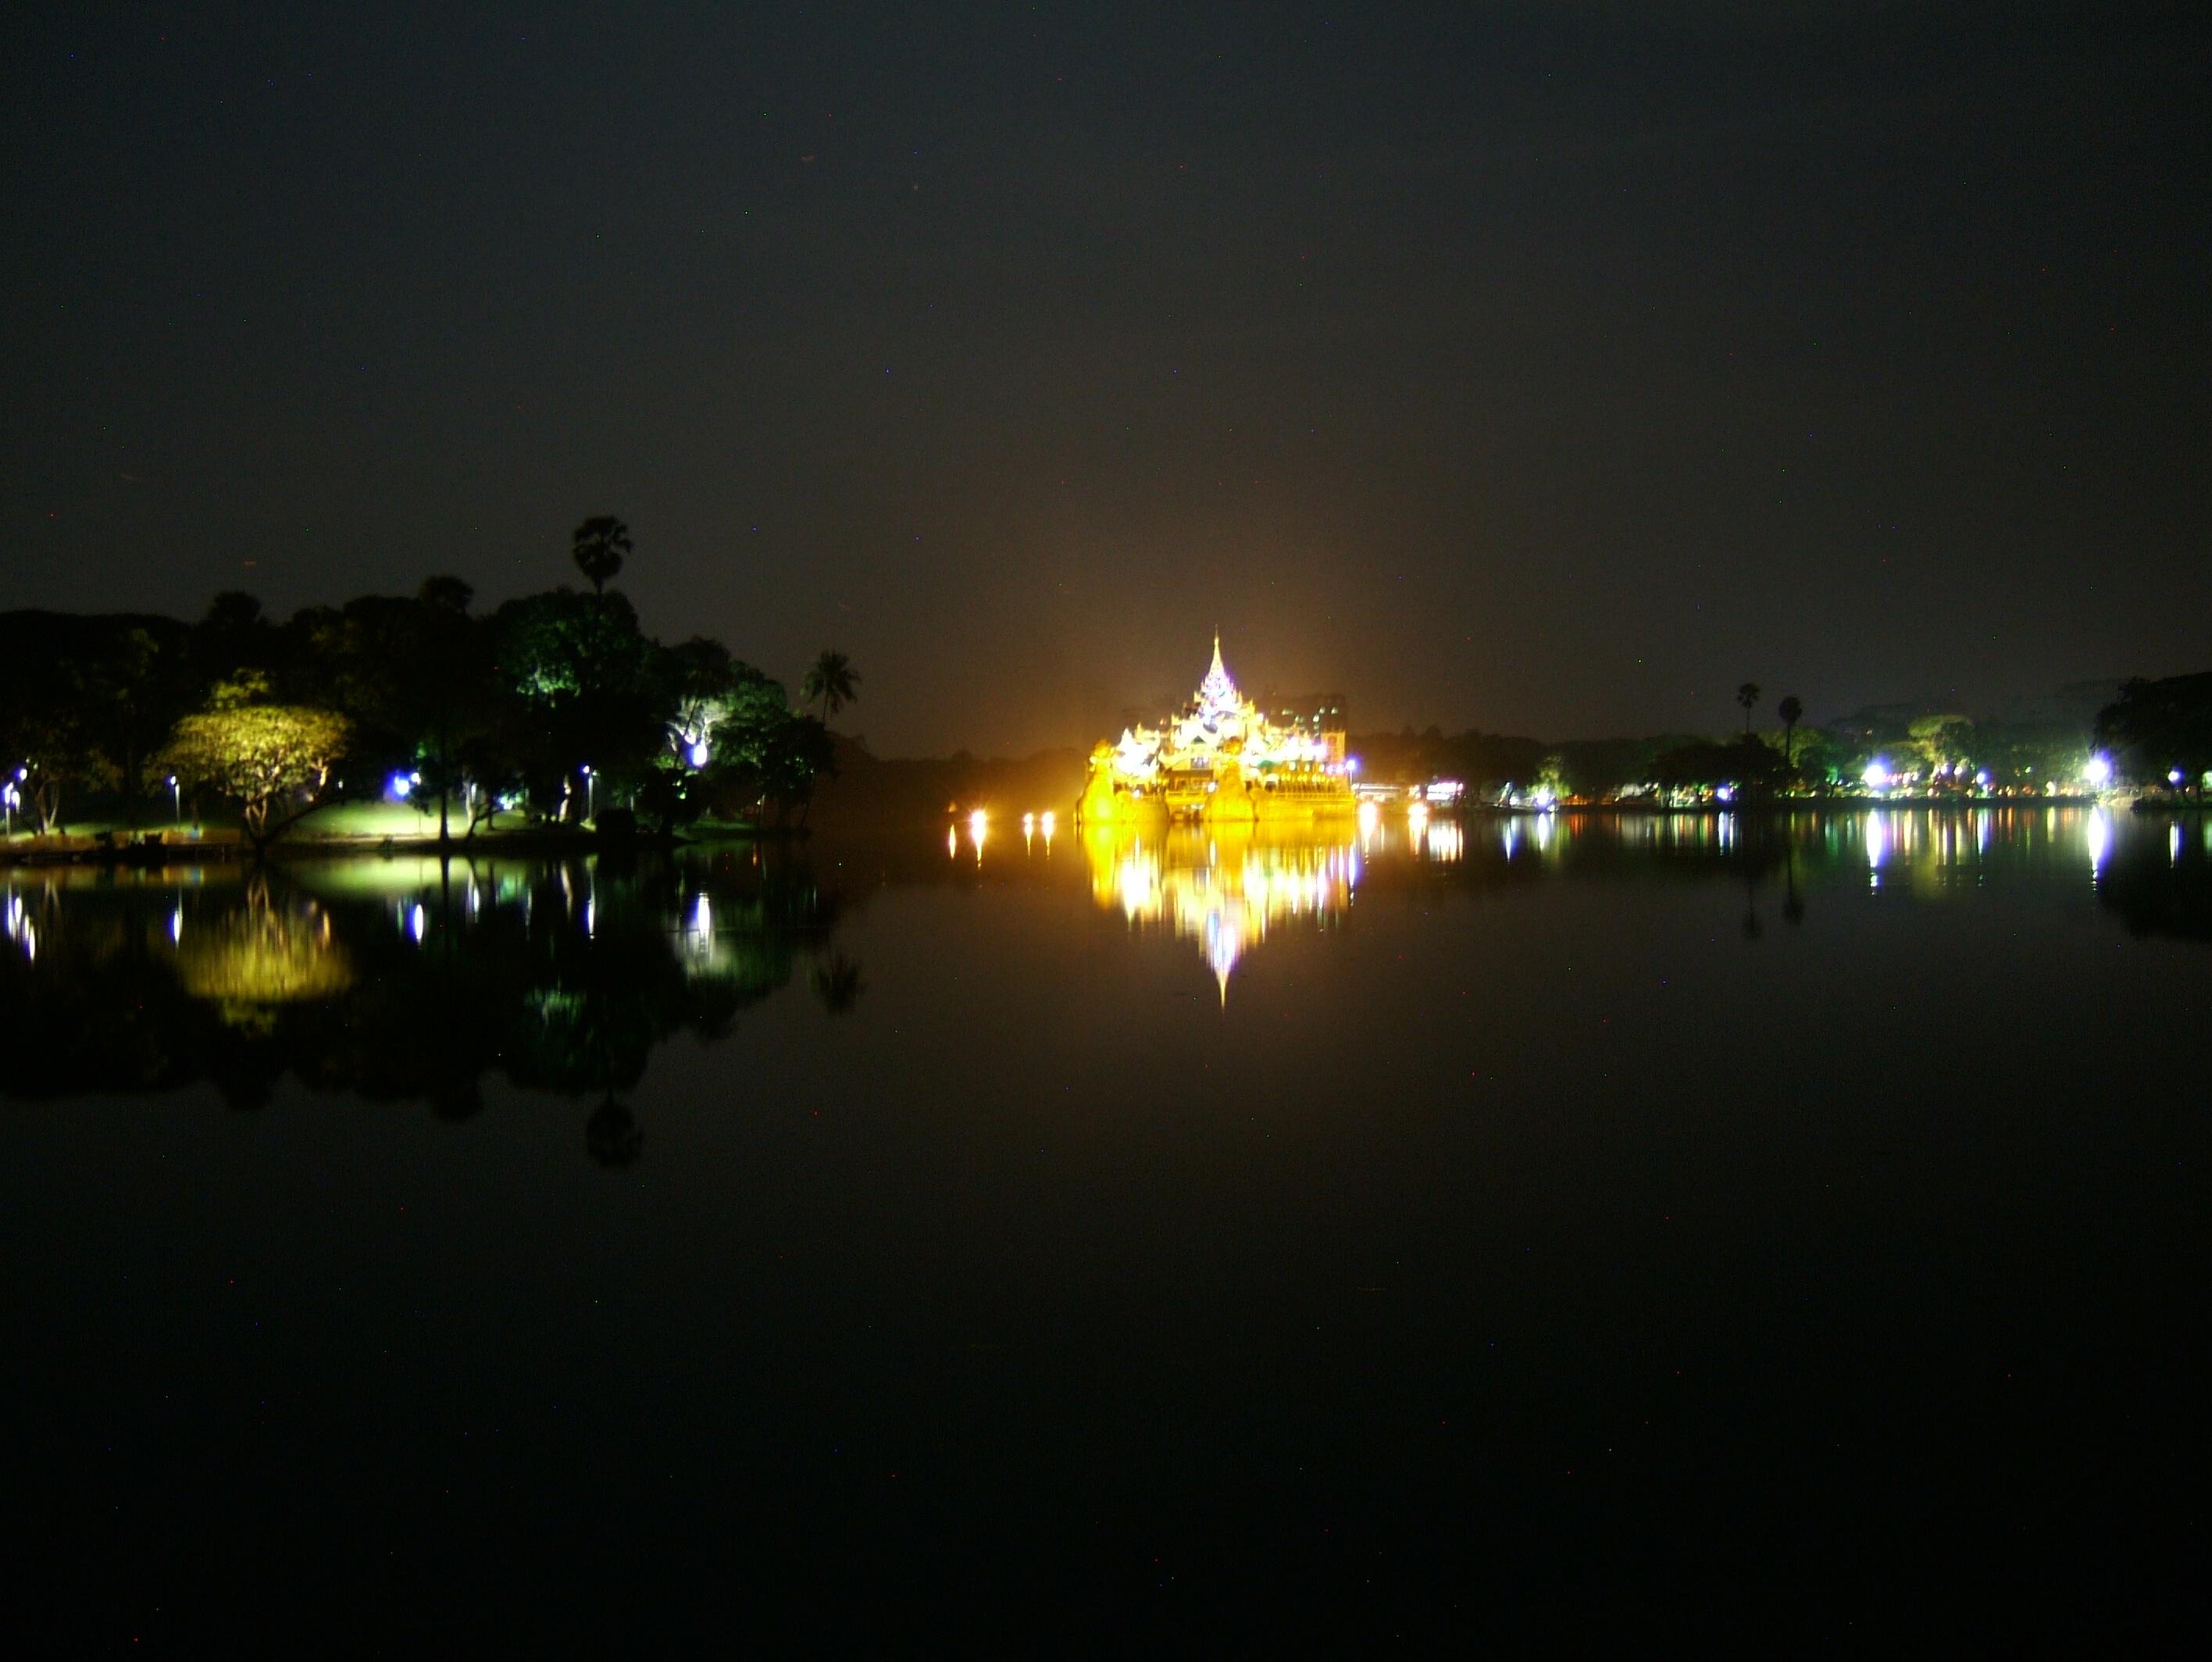 Myanmar Yangon Kandawgyi Palace Hotel royal barge Nov 2004 05